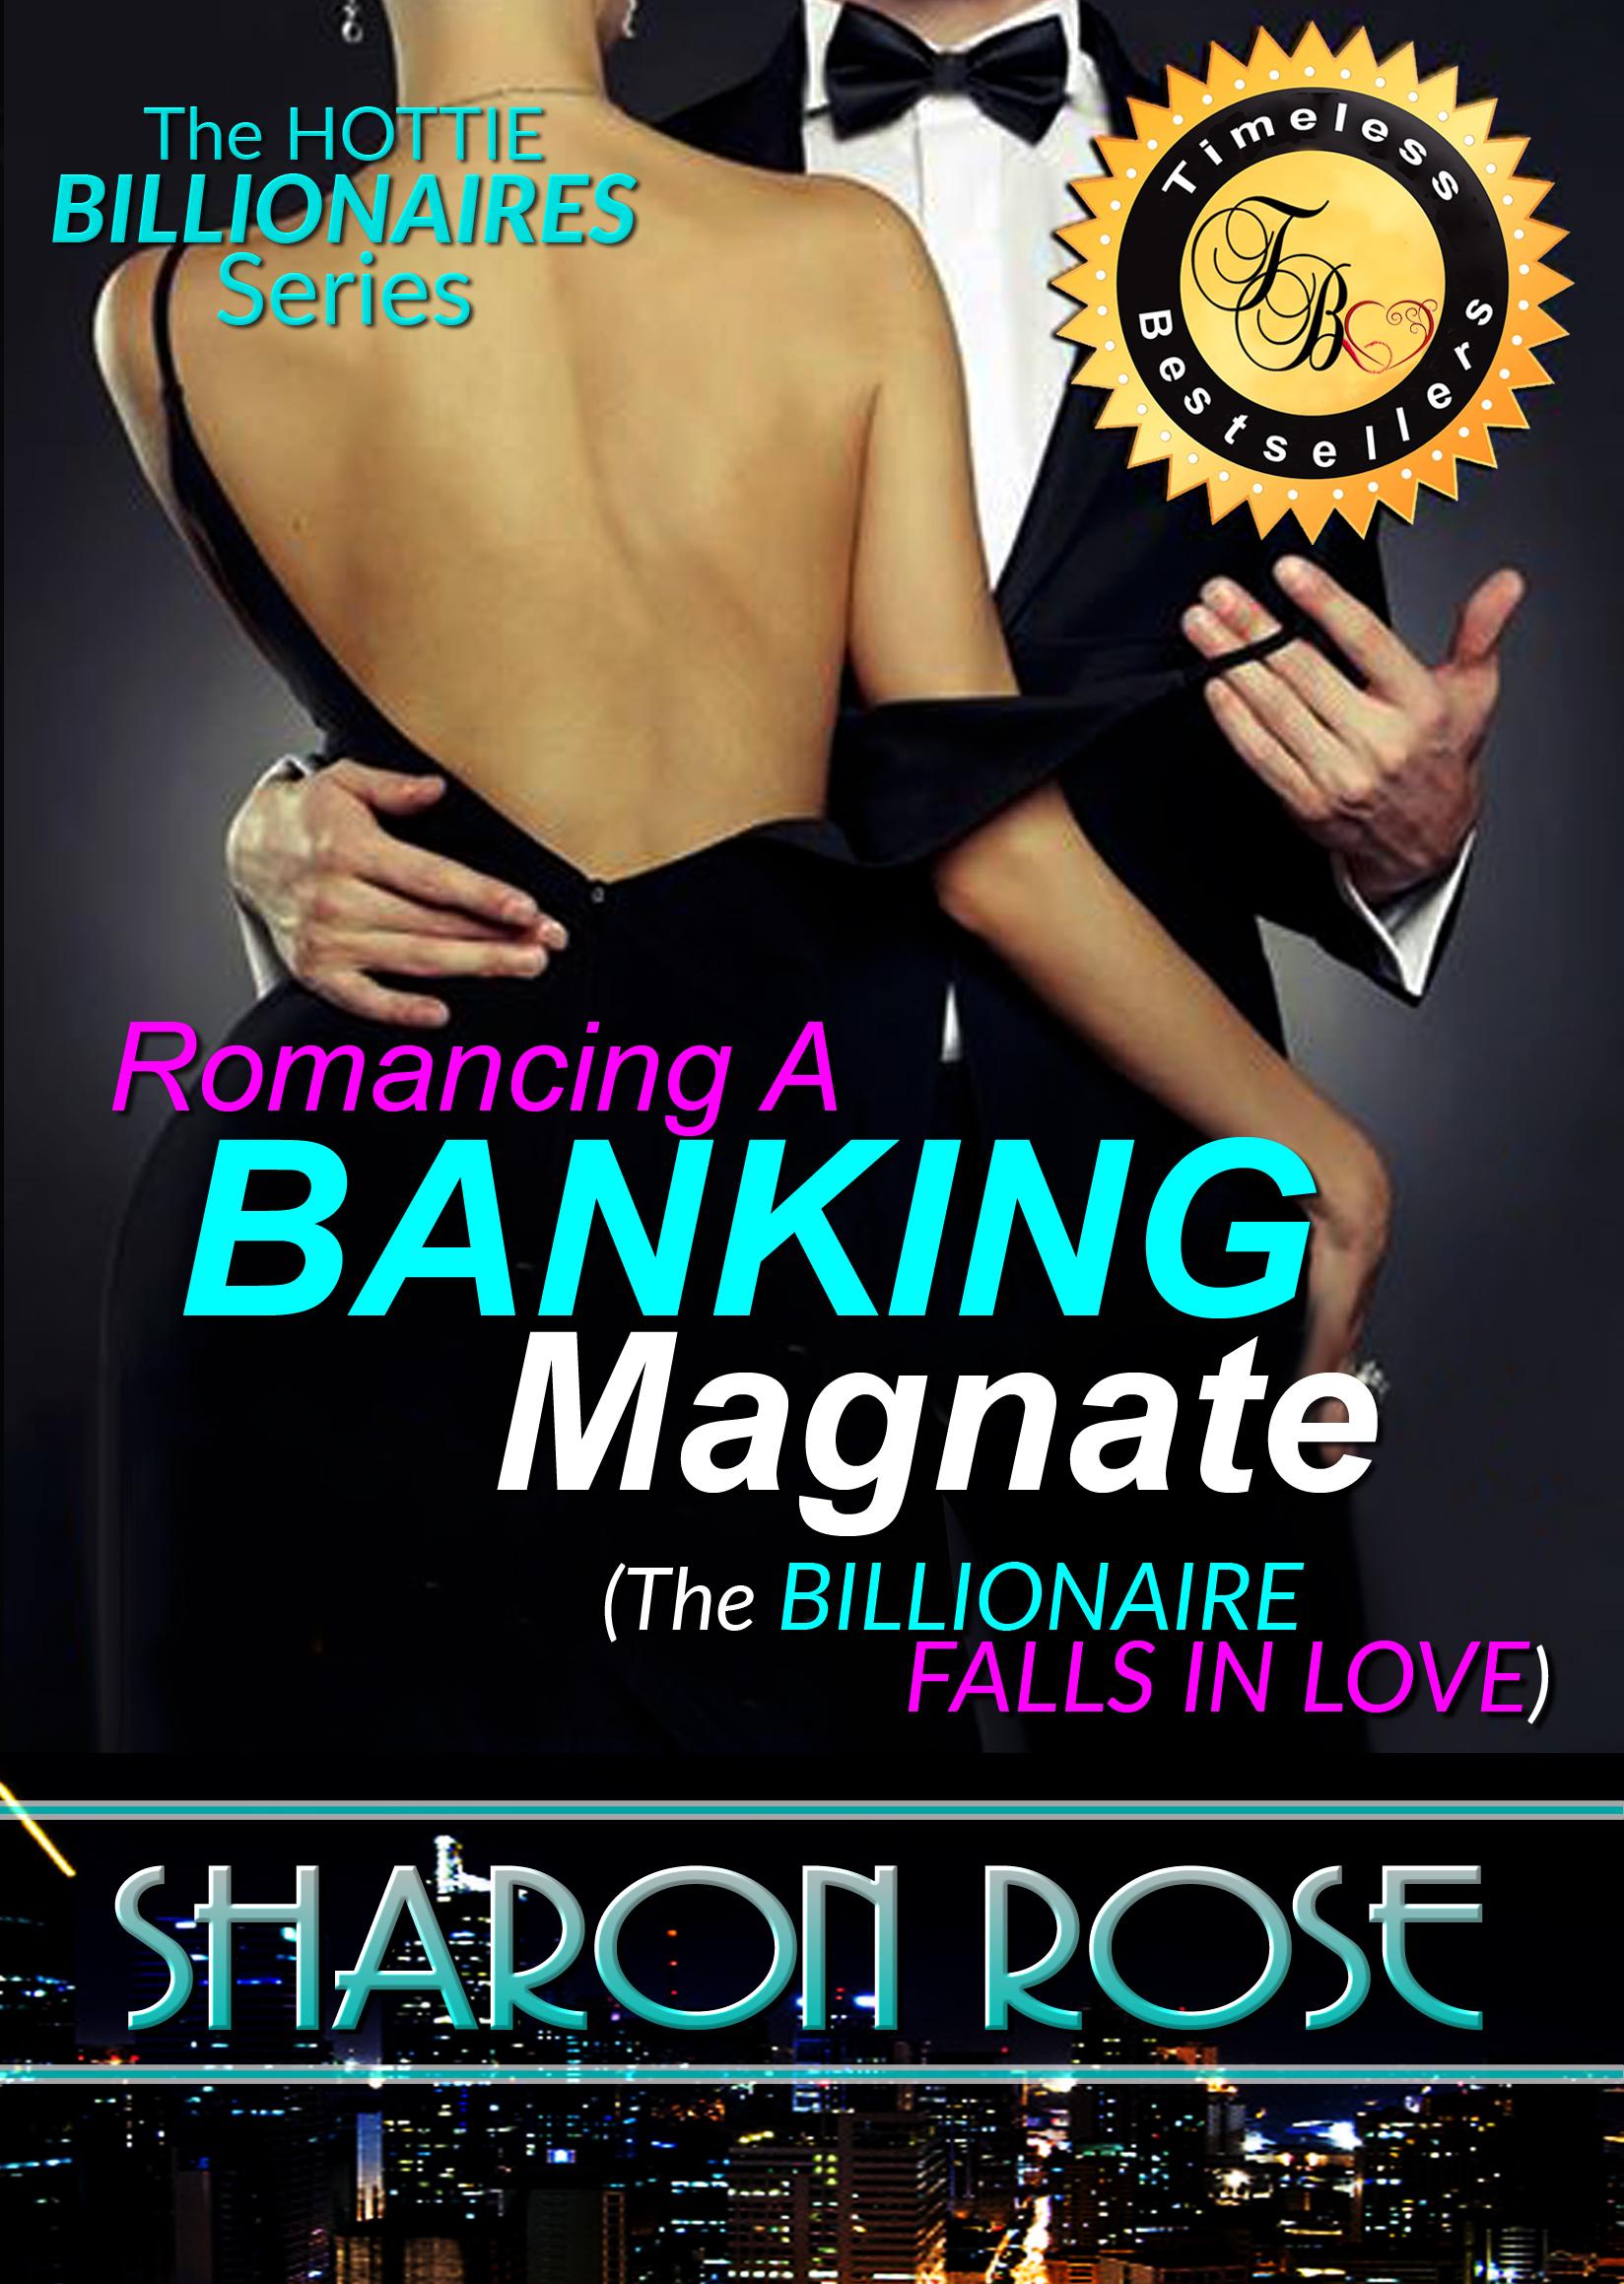 THE BILLIONAIRE BANKER EPUB NOOK EPUB DOWNLOAD